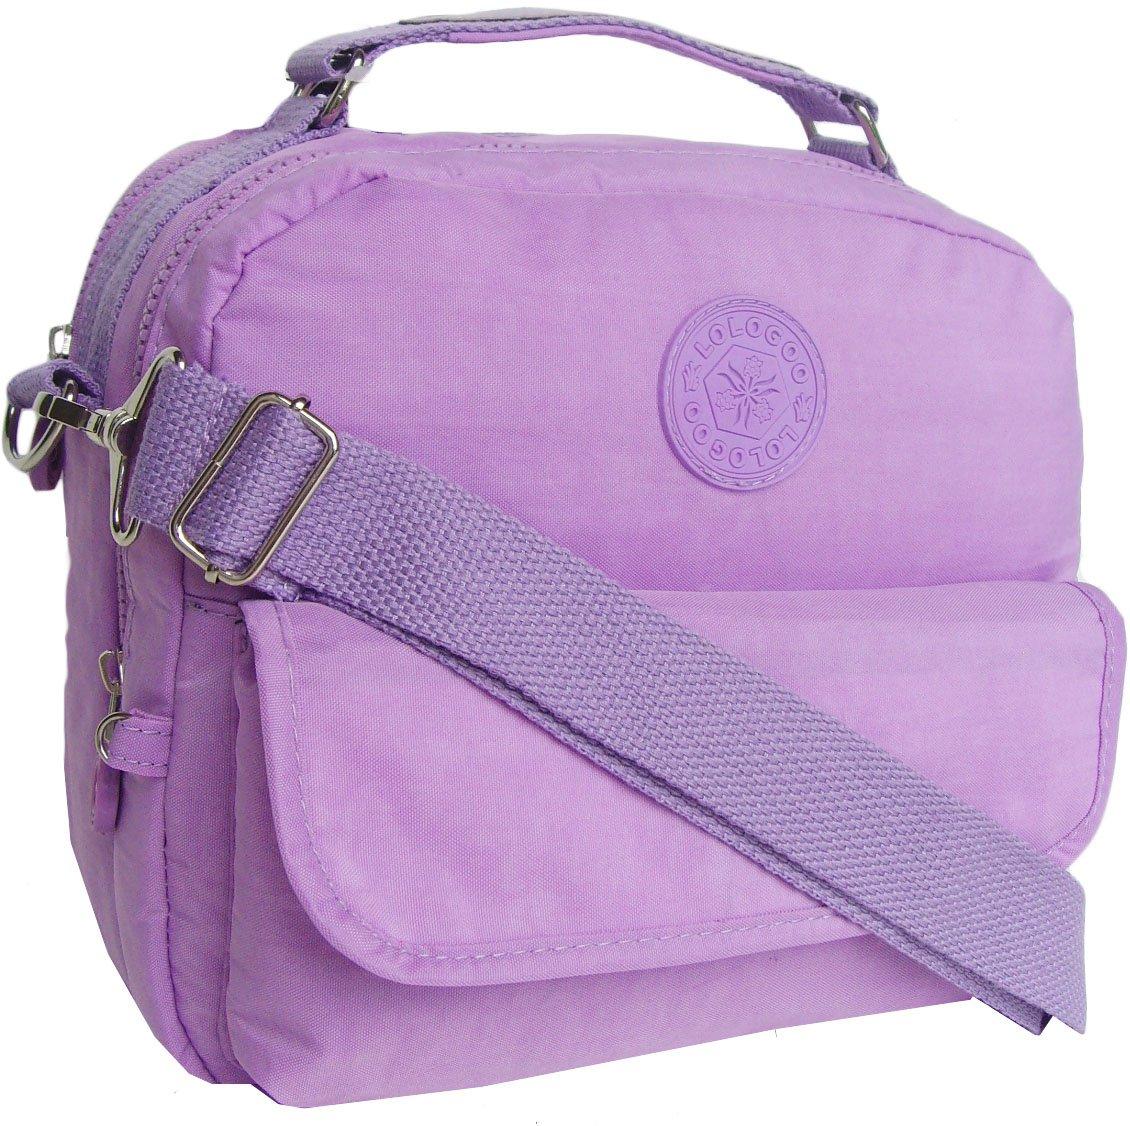 HONG YE Pure Stripe Slouch Bag,sku:hb76lightpurple3